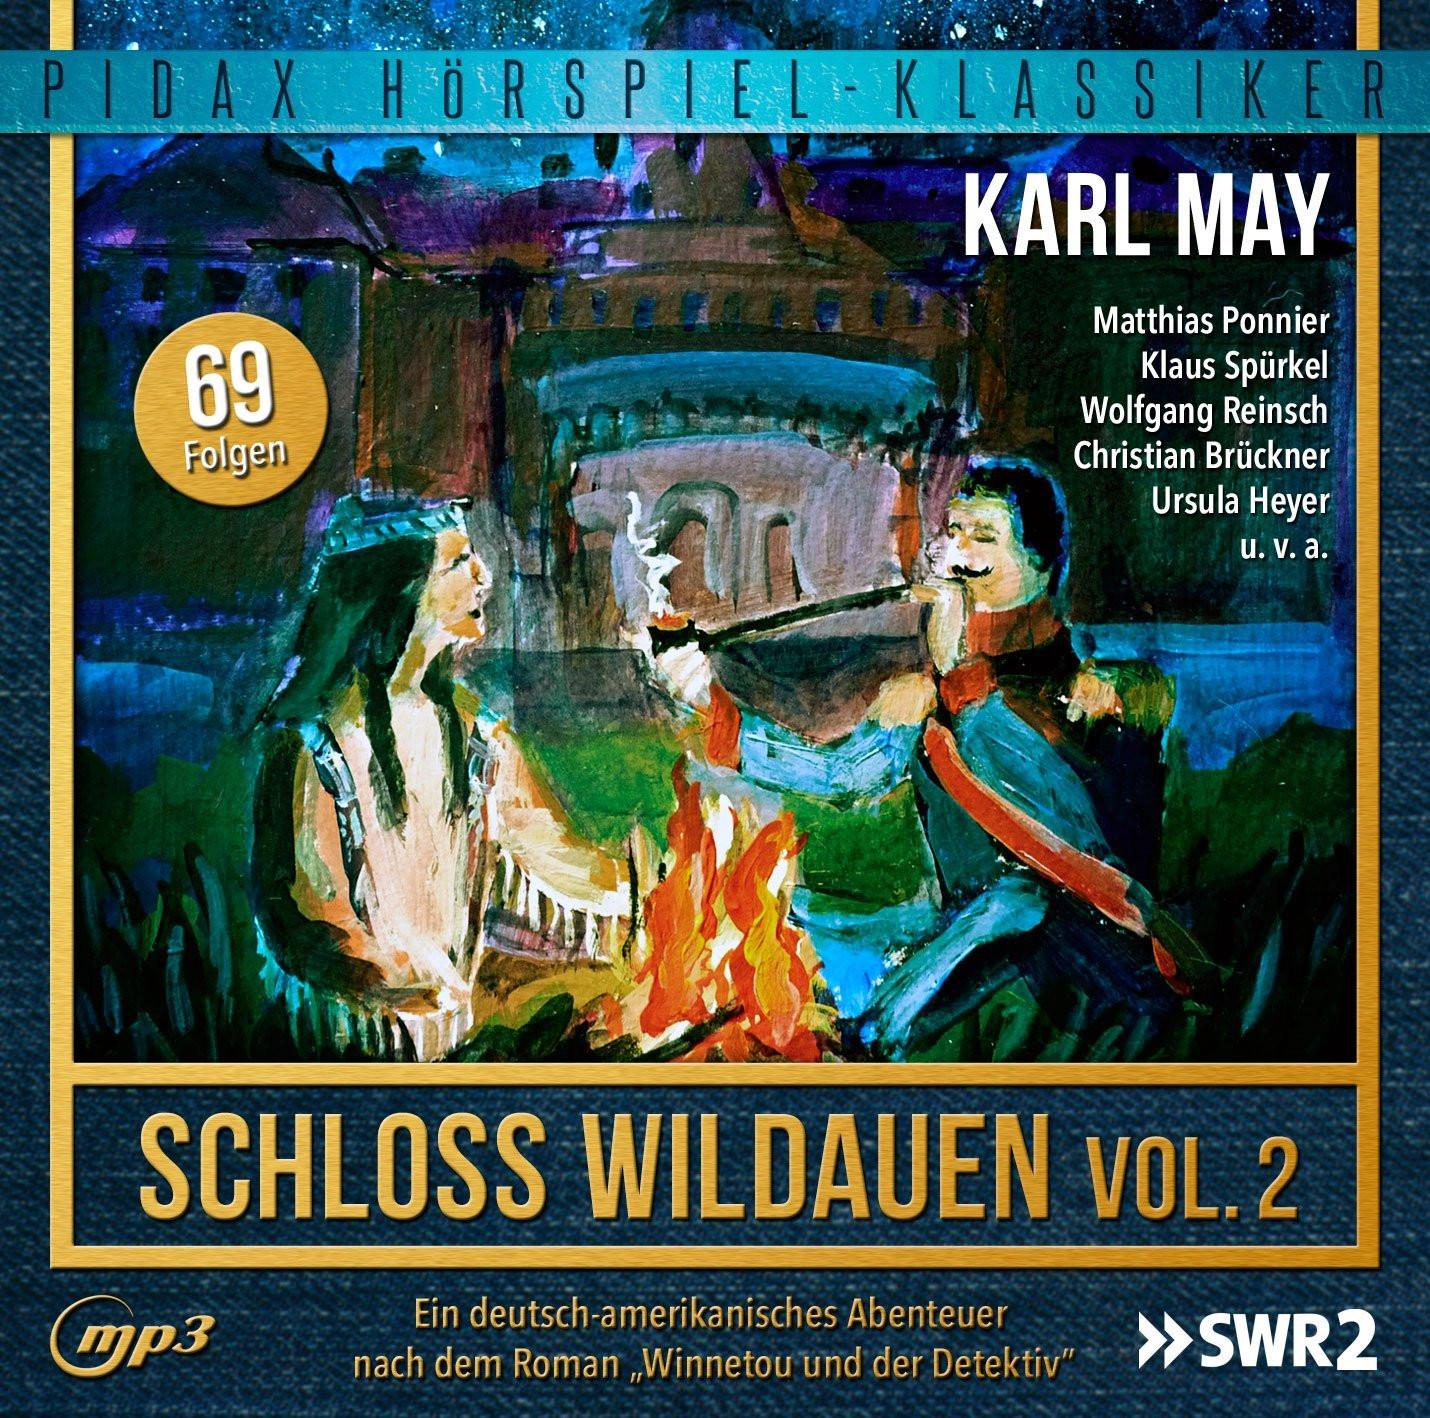 Pidax Hörspiel Klassiker - Karl May: Schloss Wildauen - Vol. 2